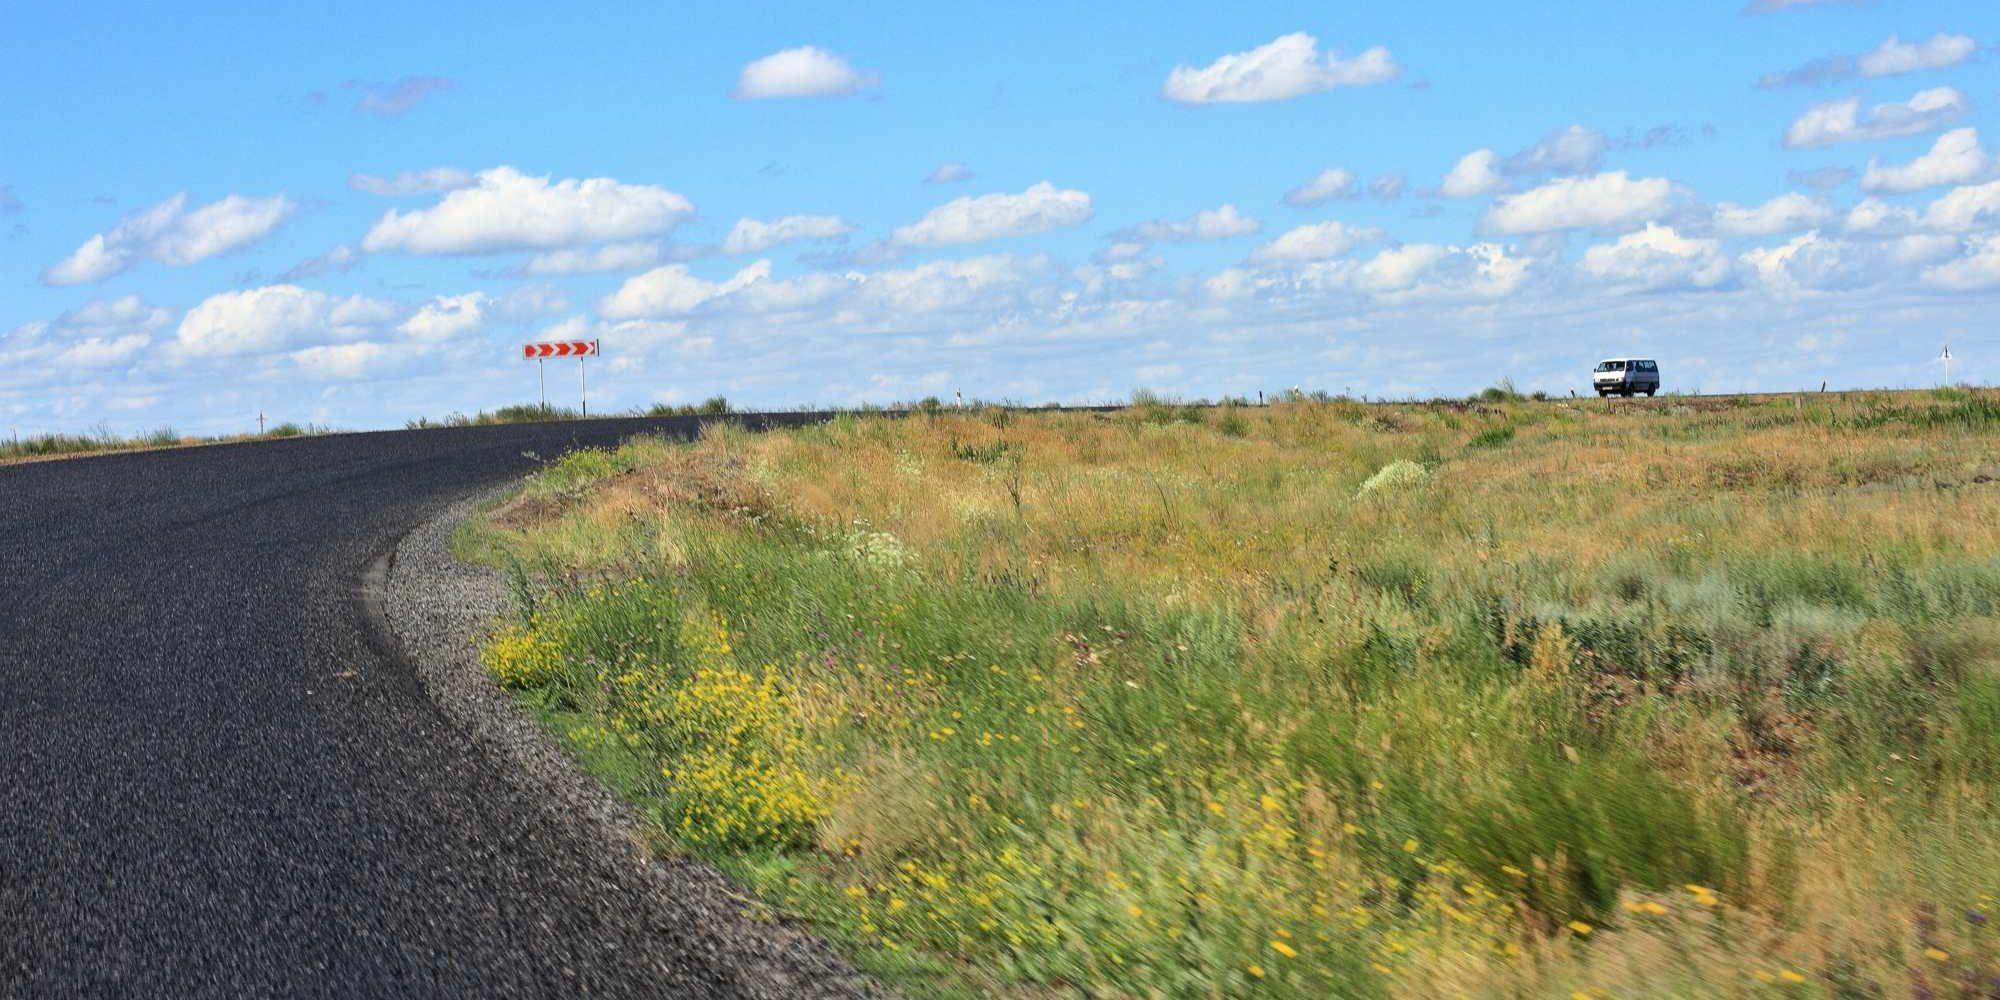 Precej dobre ceste po severu Kazahstana, ob meji z Rusko federacijo.